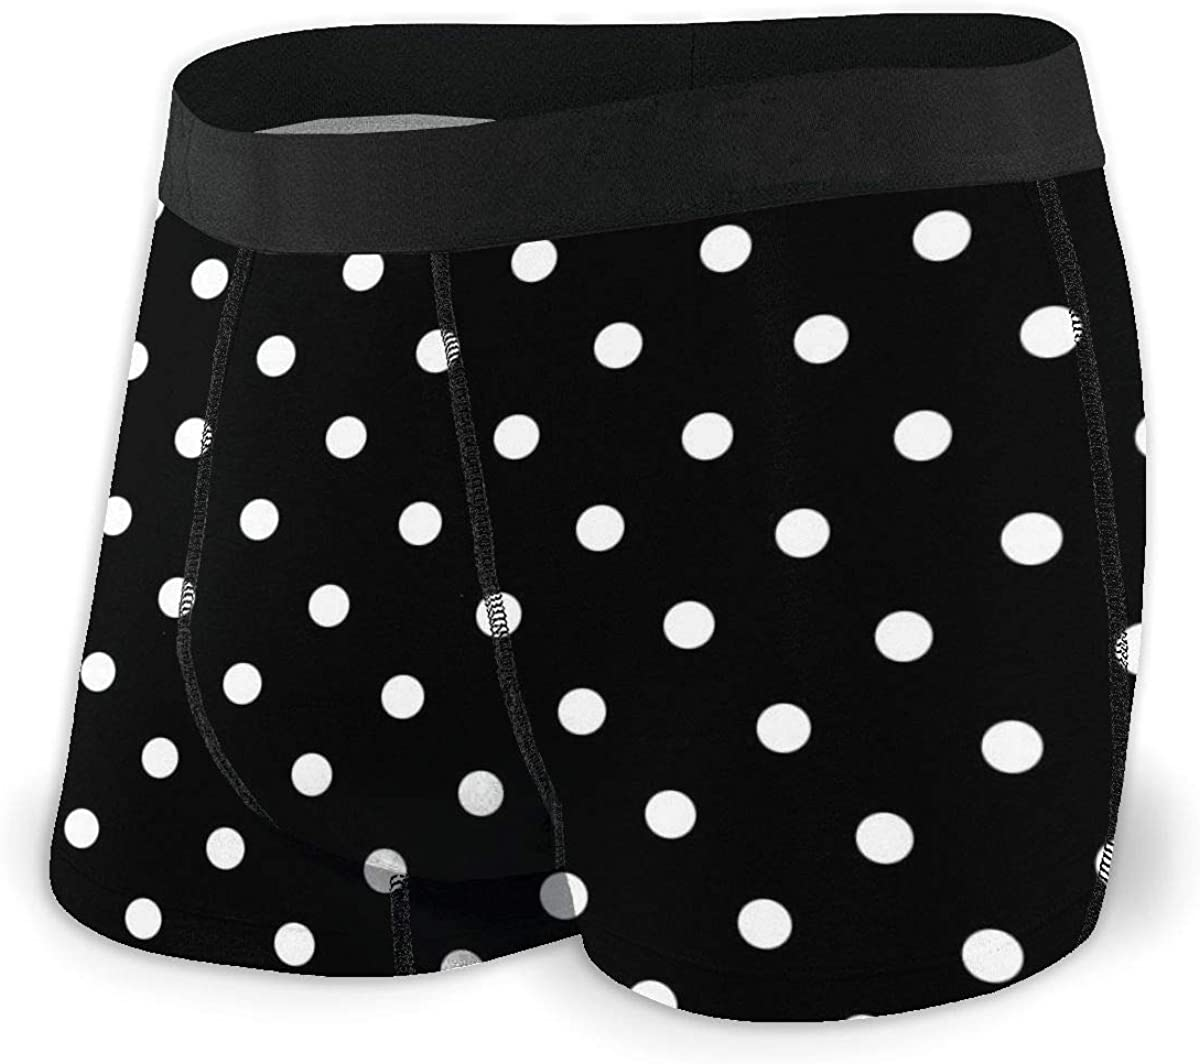 Mens Boxer Briefs Butterfly Polka Dots Bikini Underwear Stretch Low Rise Trunks Boys Underpants